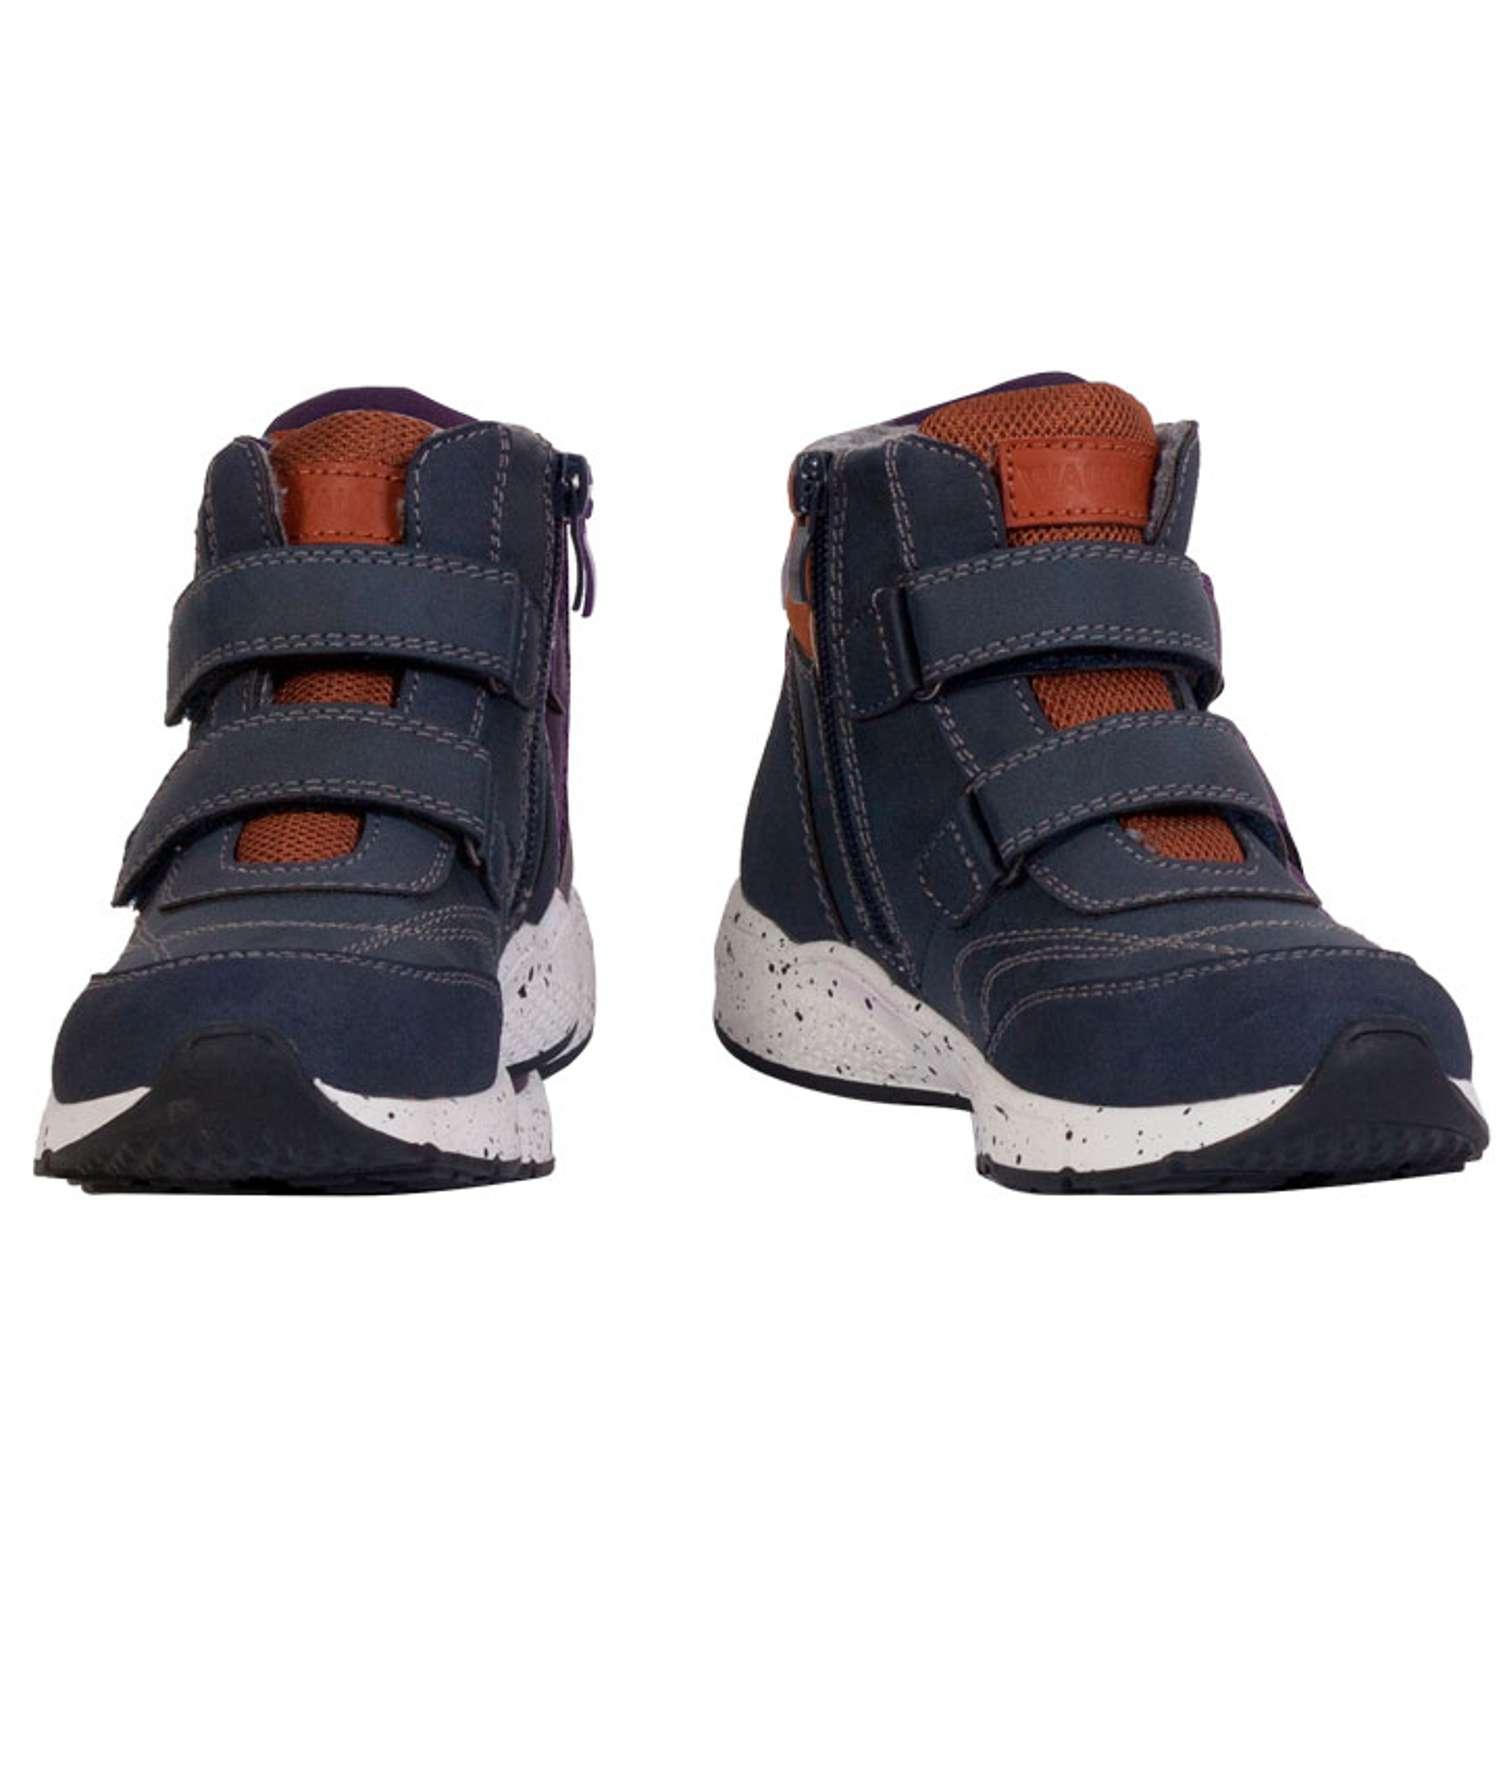 Walkway - Akako børne vinter sneakers - Mørkeblå - Størrelse 29